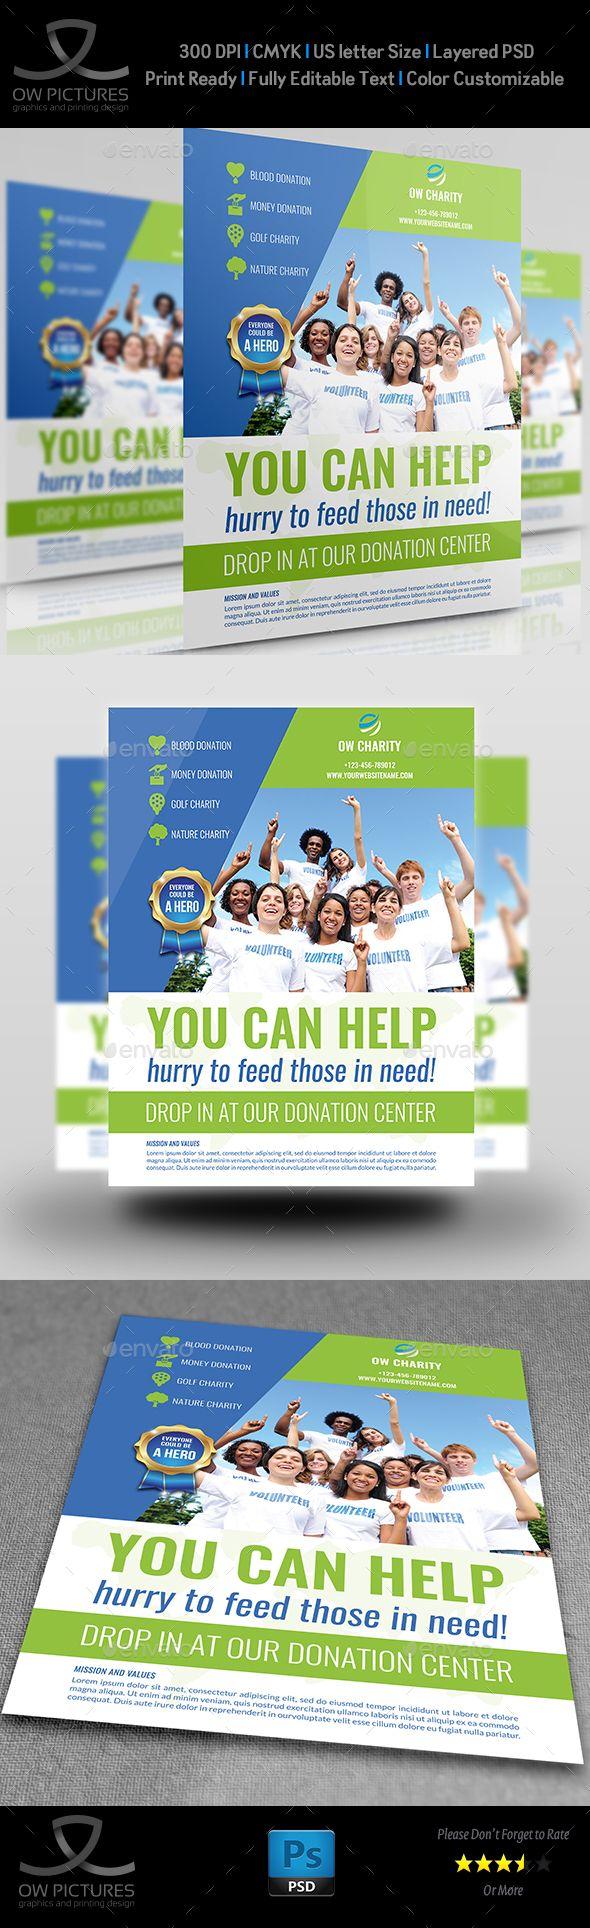 Poster design template psd - Volunteer Flyer Design Template Corporate Flyer Design Template Psd Download Here Https